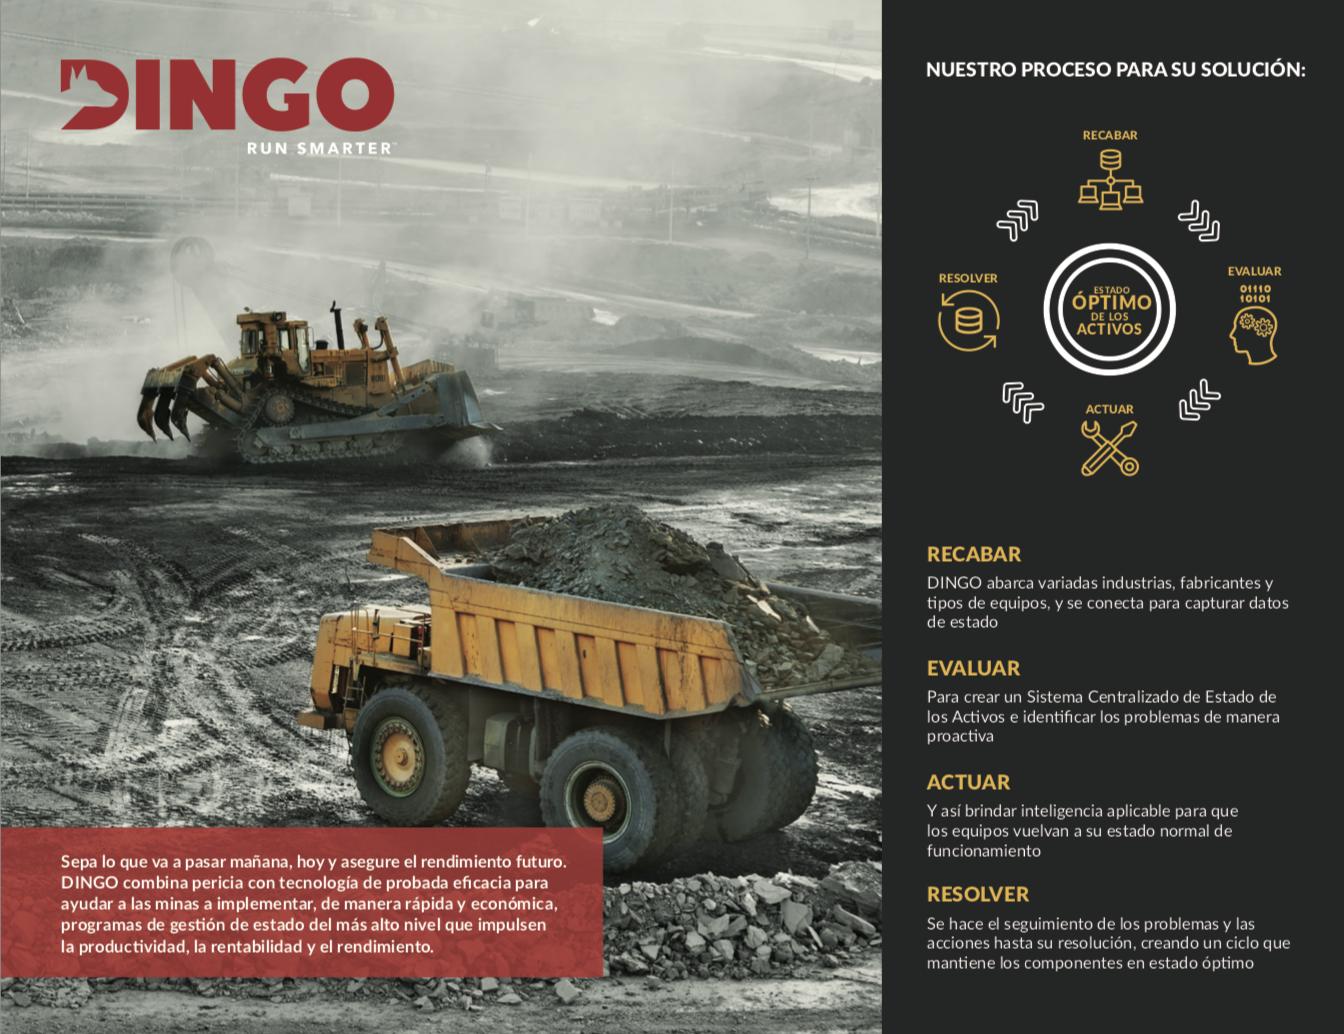 proceso-para-solucion-dingo-1